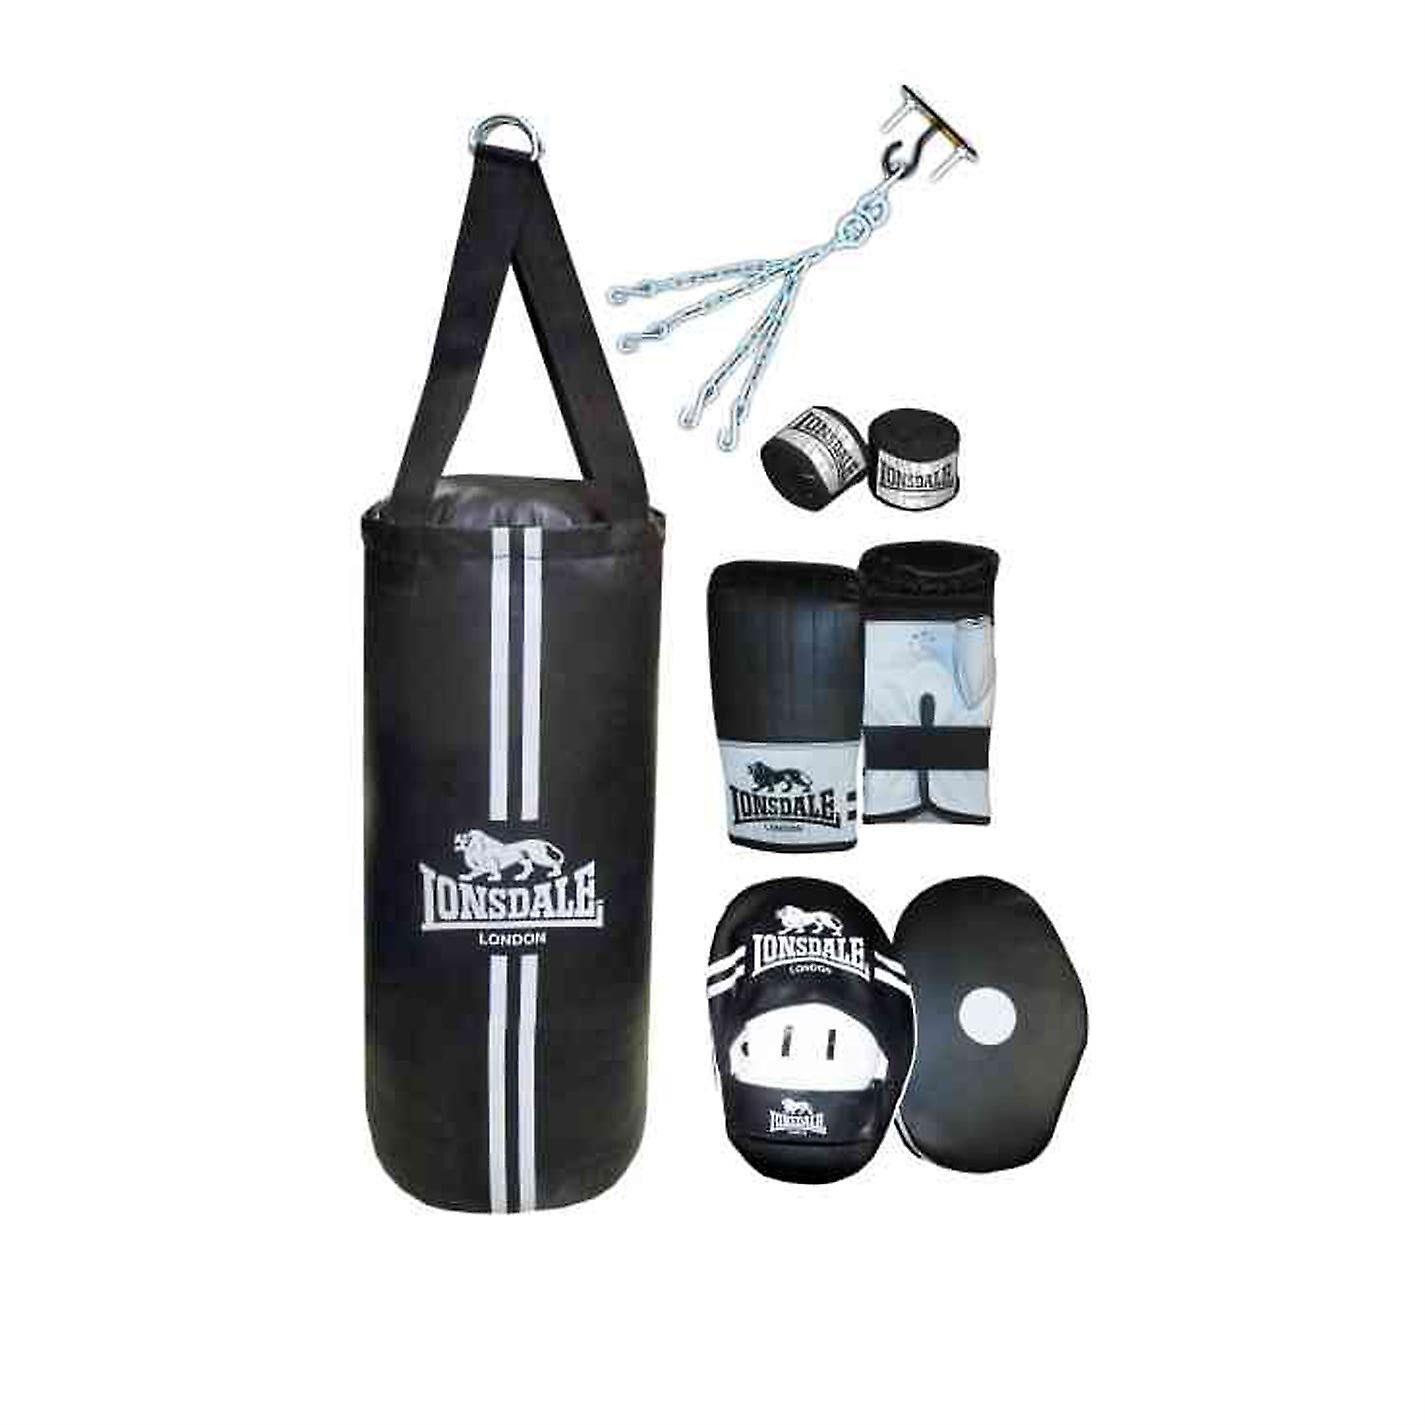 Lonsdale Contender Boxset Punch Bag Mitts Hook Et Jab Pads Hand Wrap Training Noir One Size